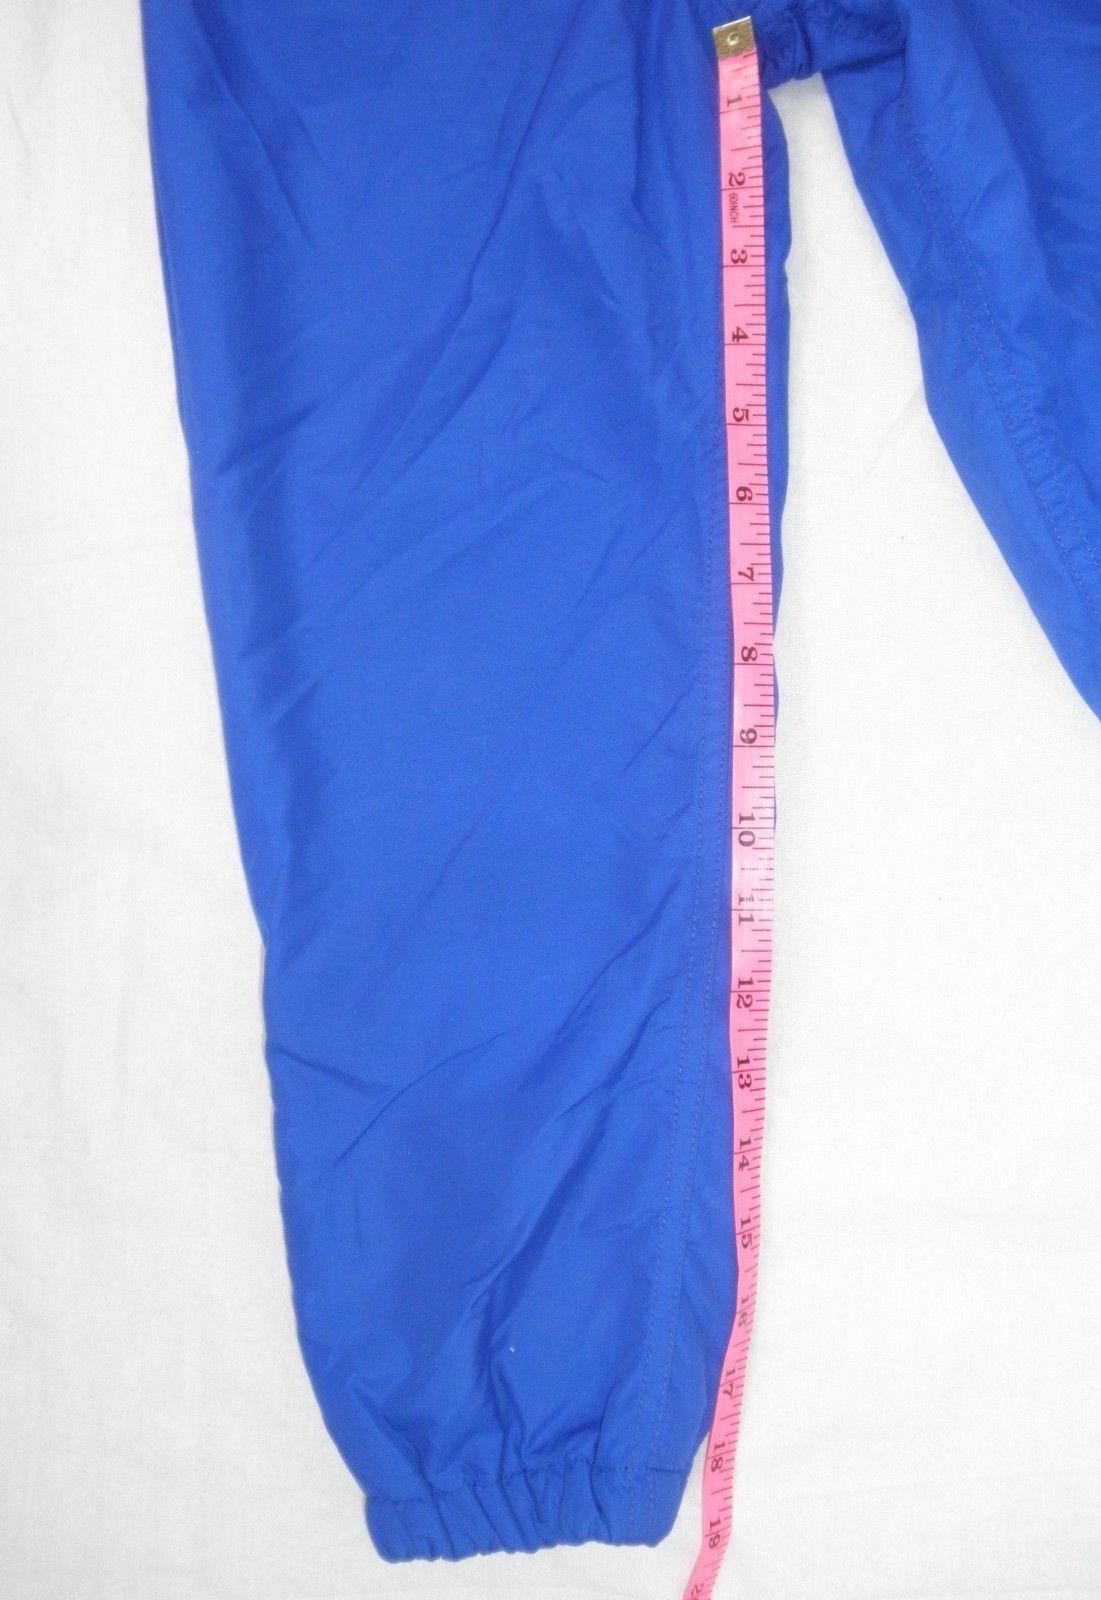 8e2cf7dd4 LL Bean Royal Blue Fleece Lined Snow Pants and 22 similar items